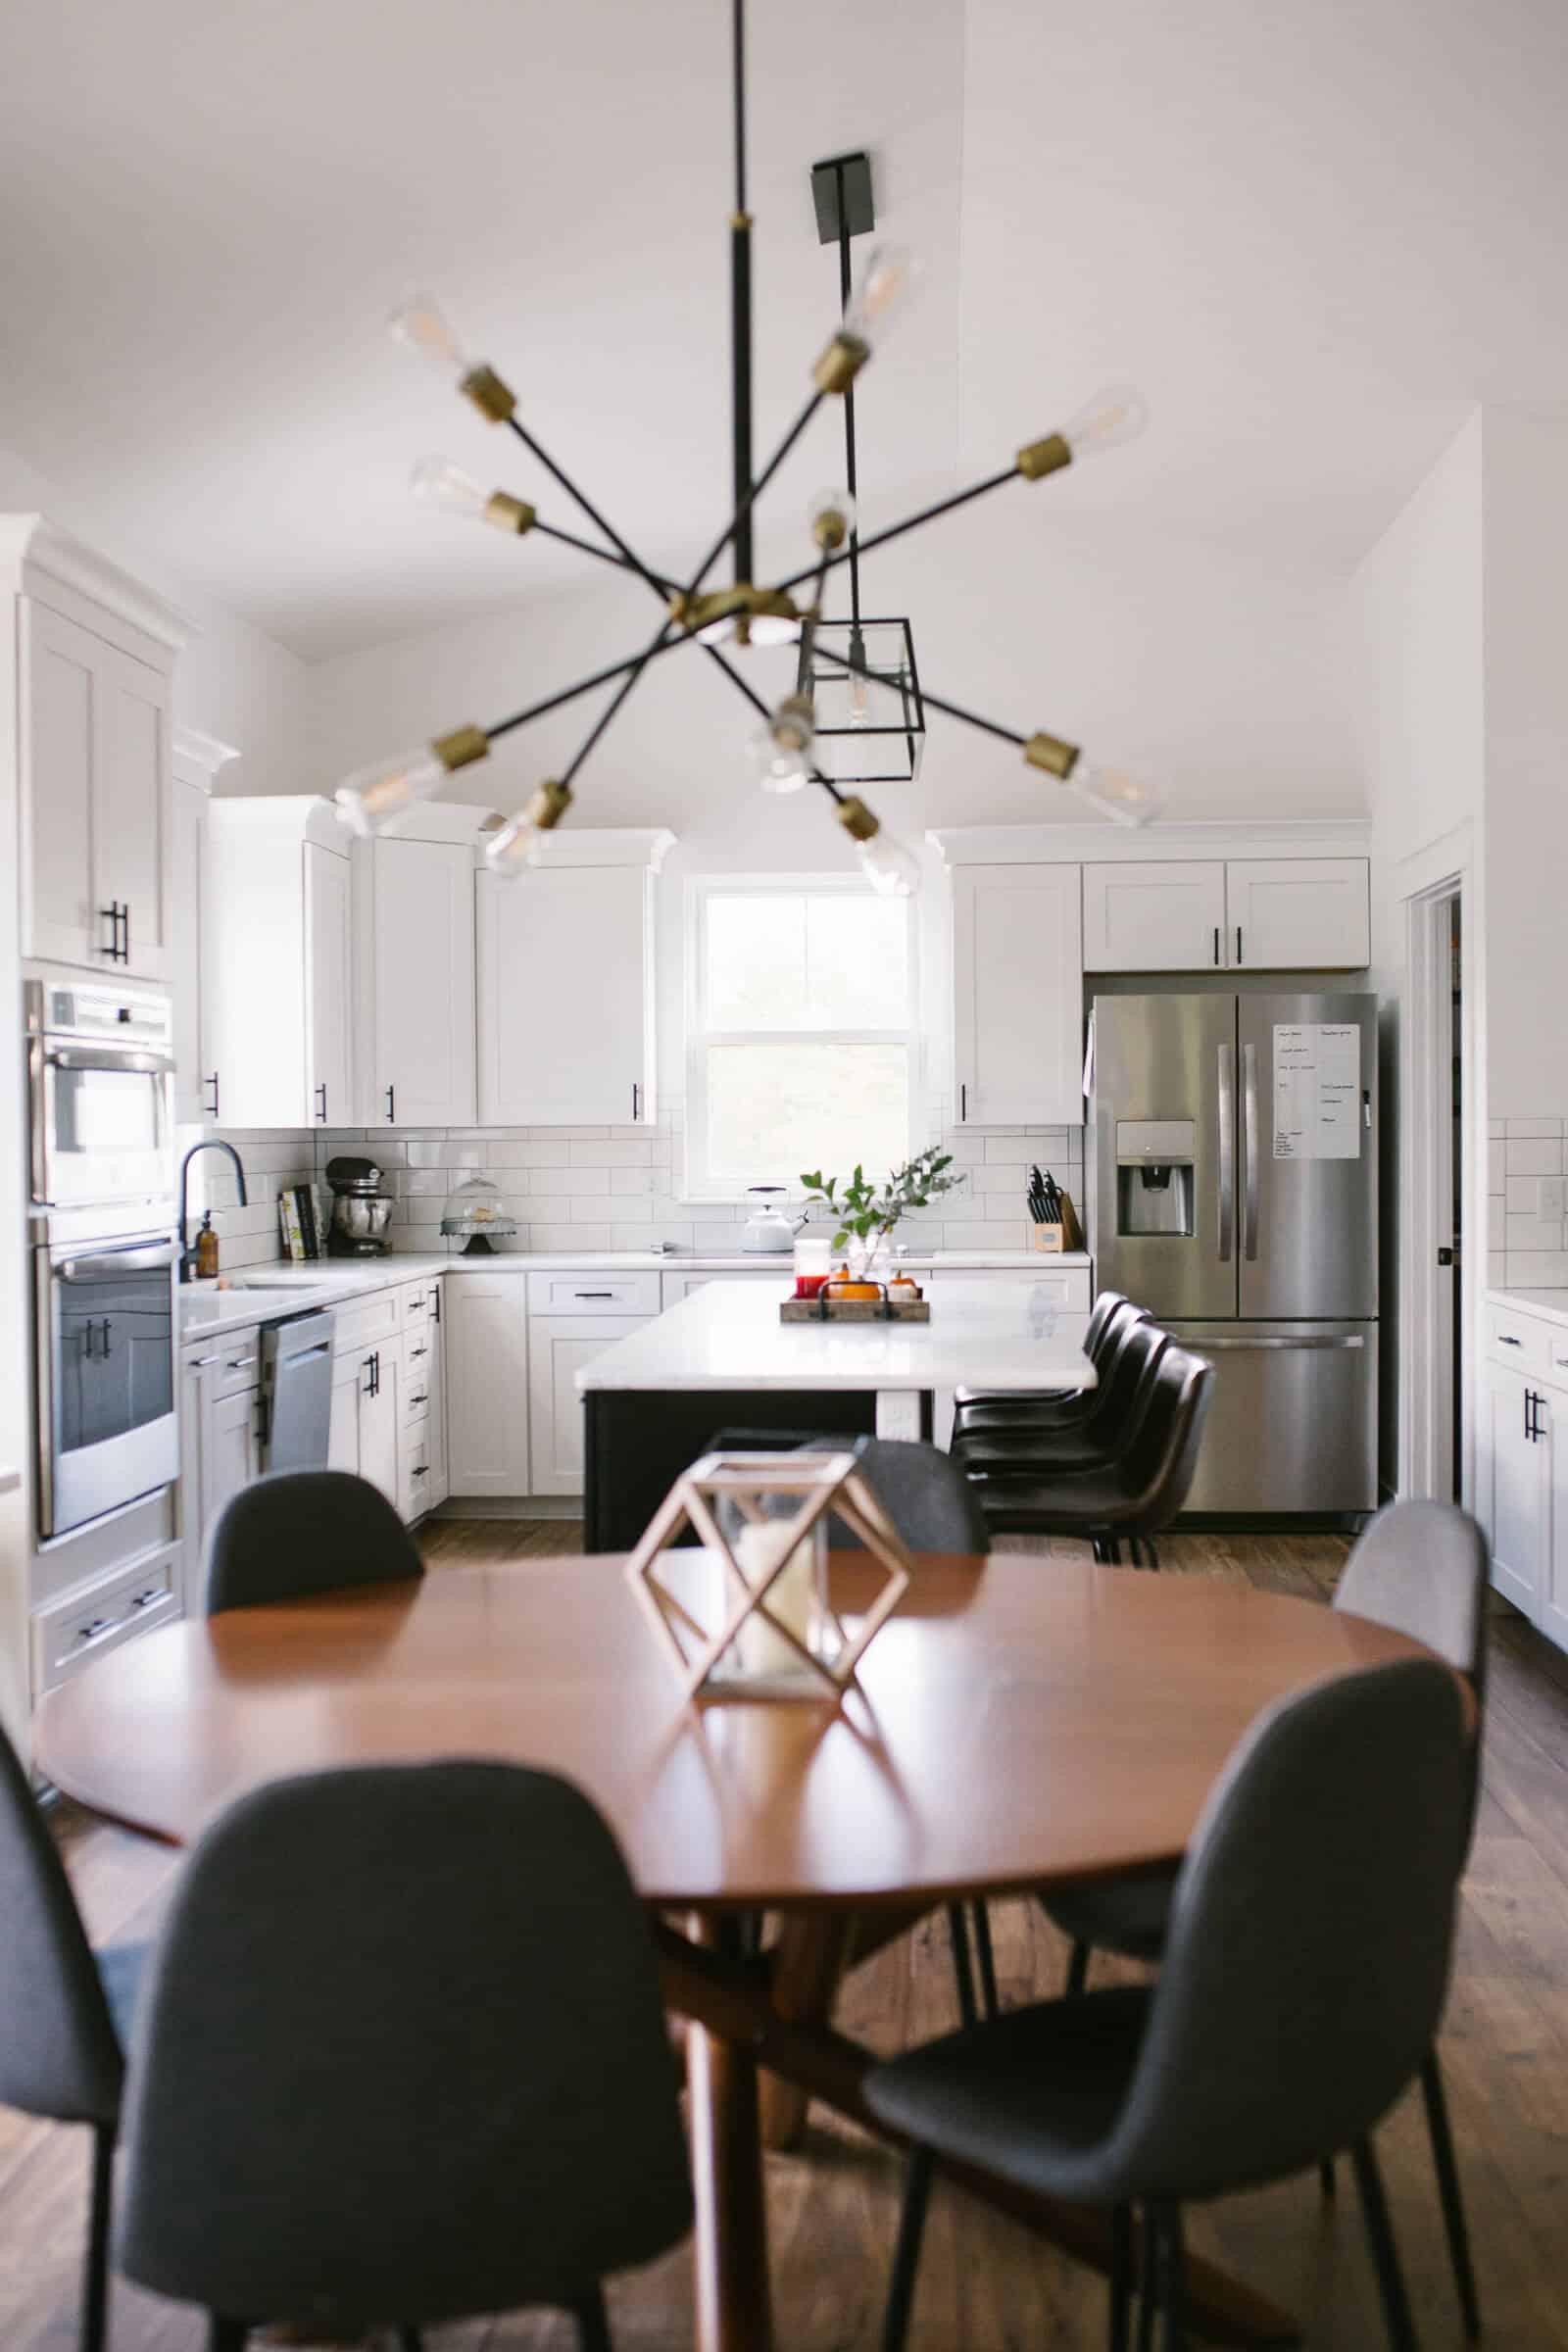 white modern kitchen design with white kitchen cabinets and a black island